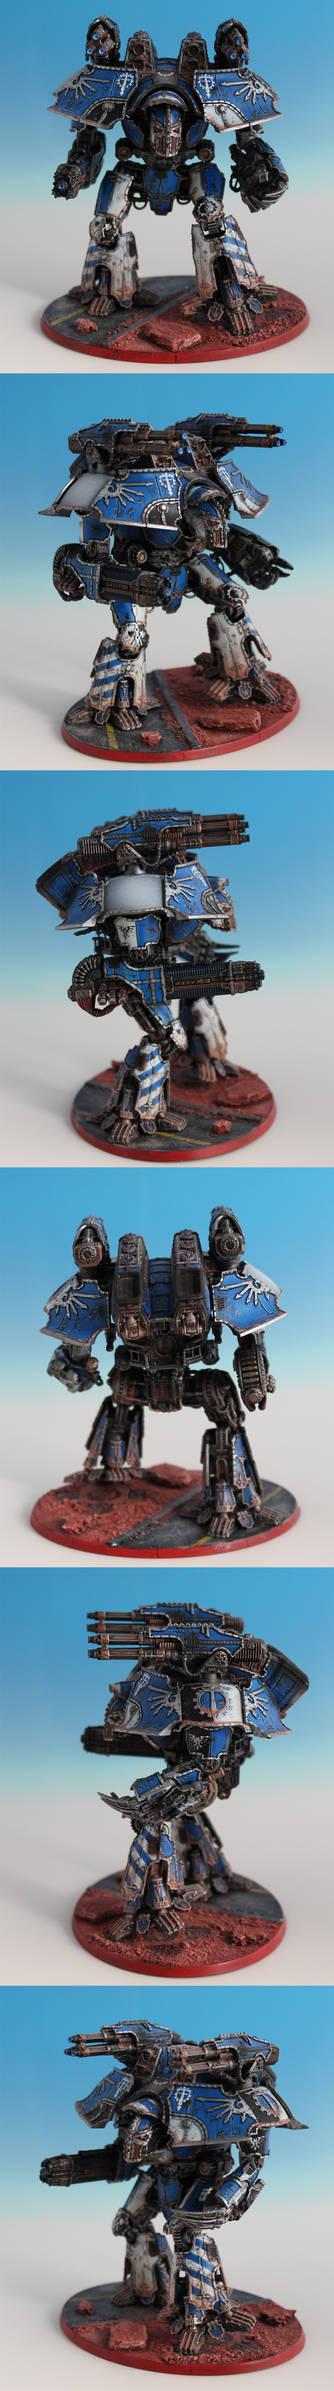 Warlord Battle Titan Deus Tempestus